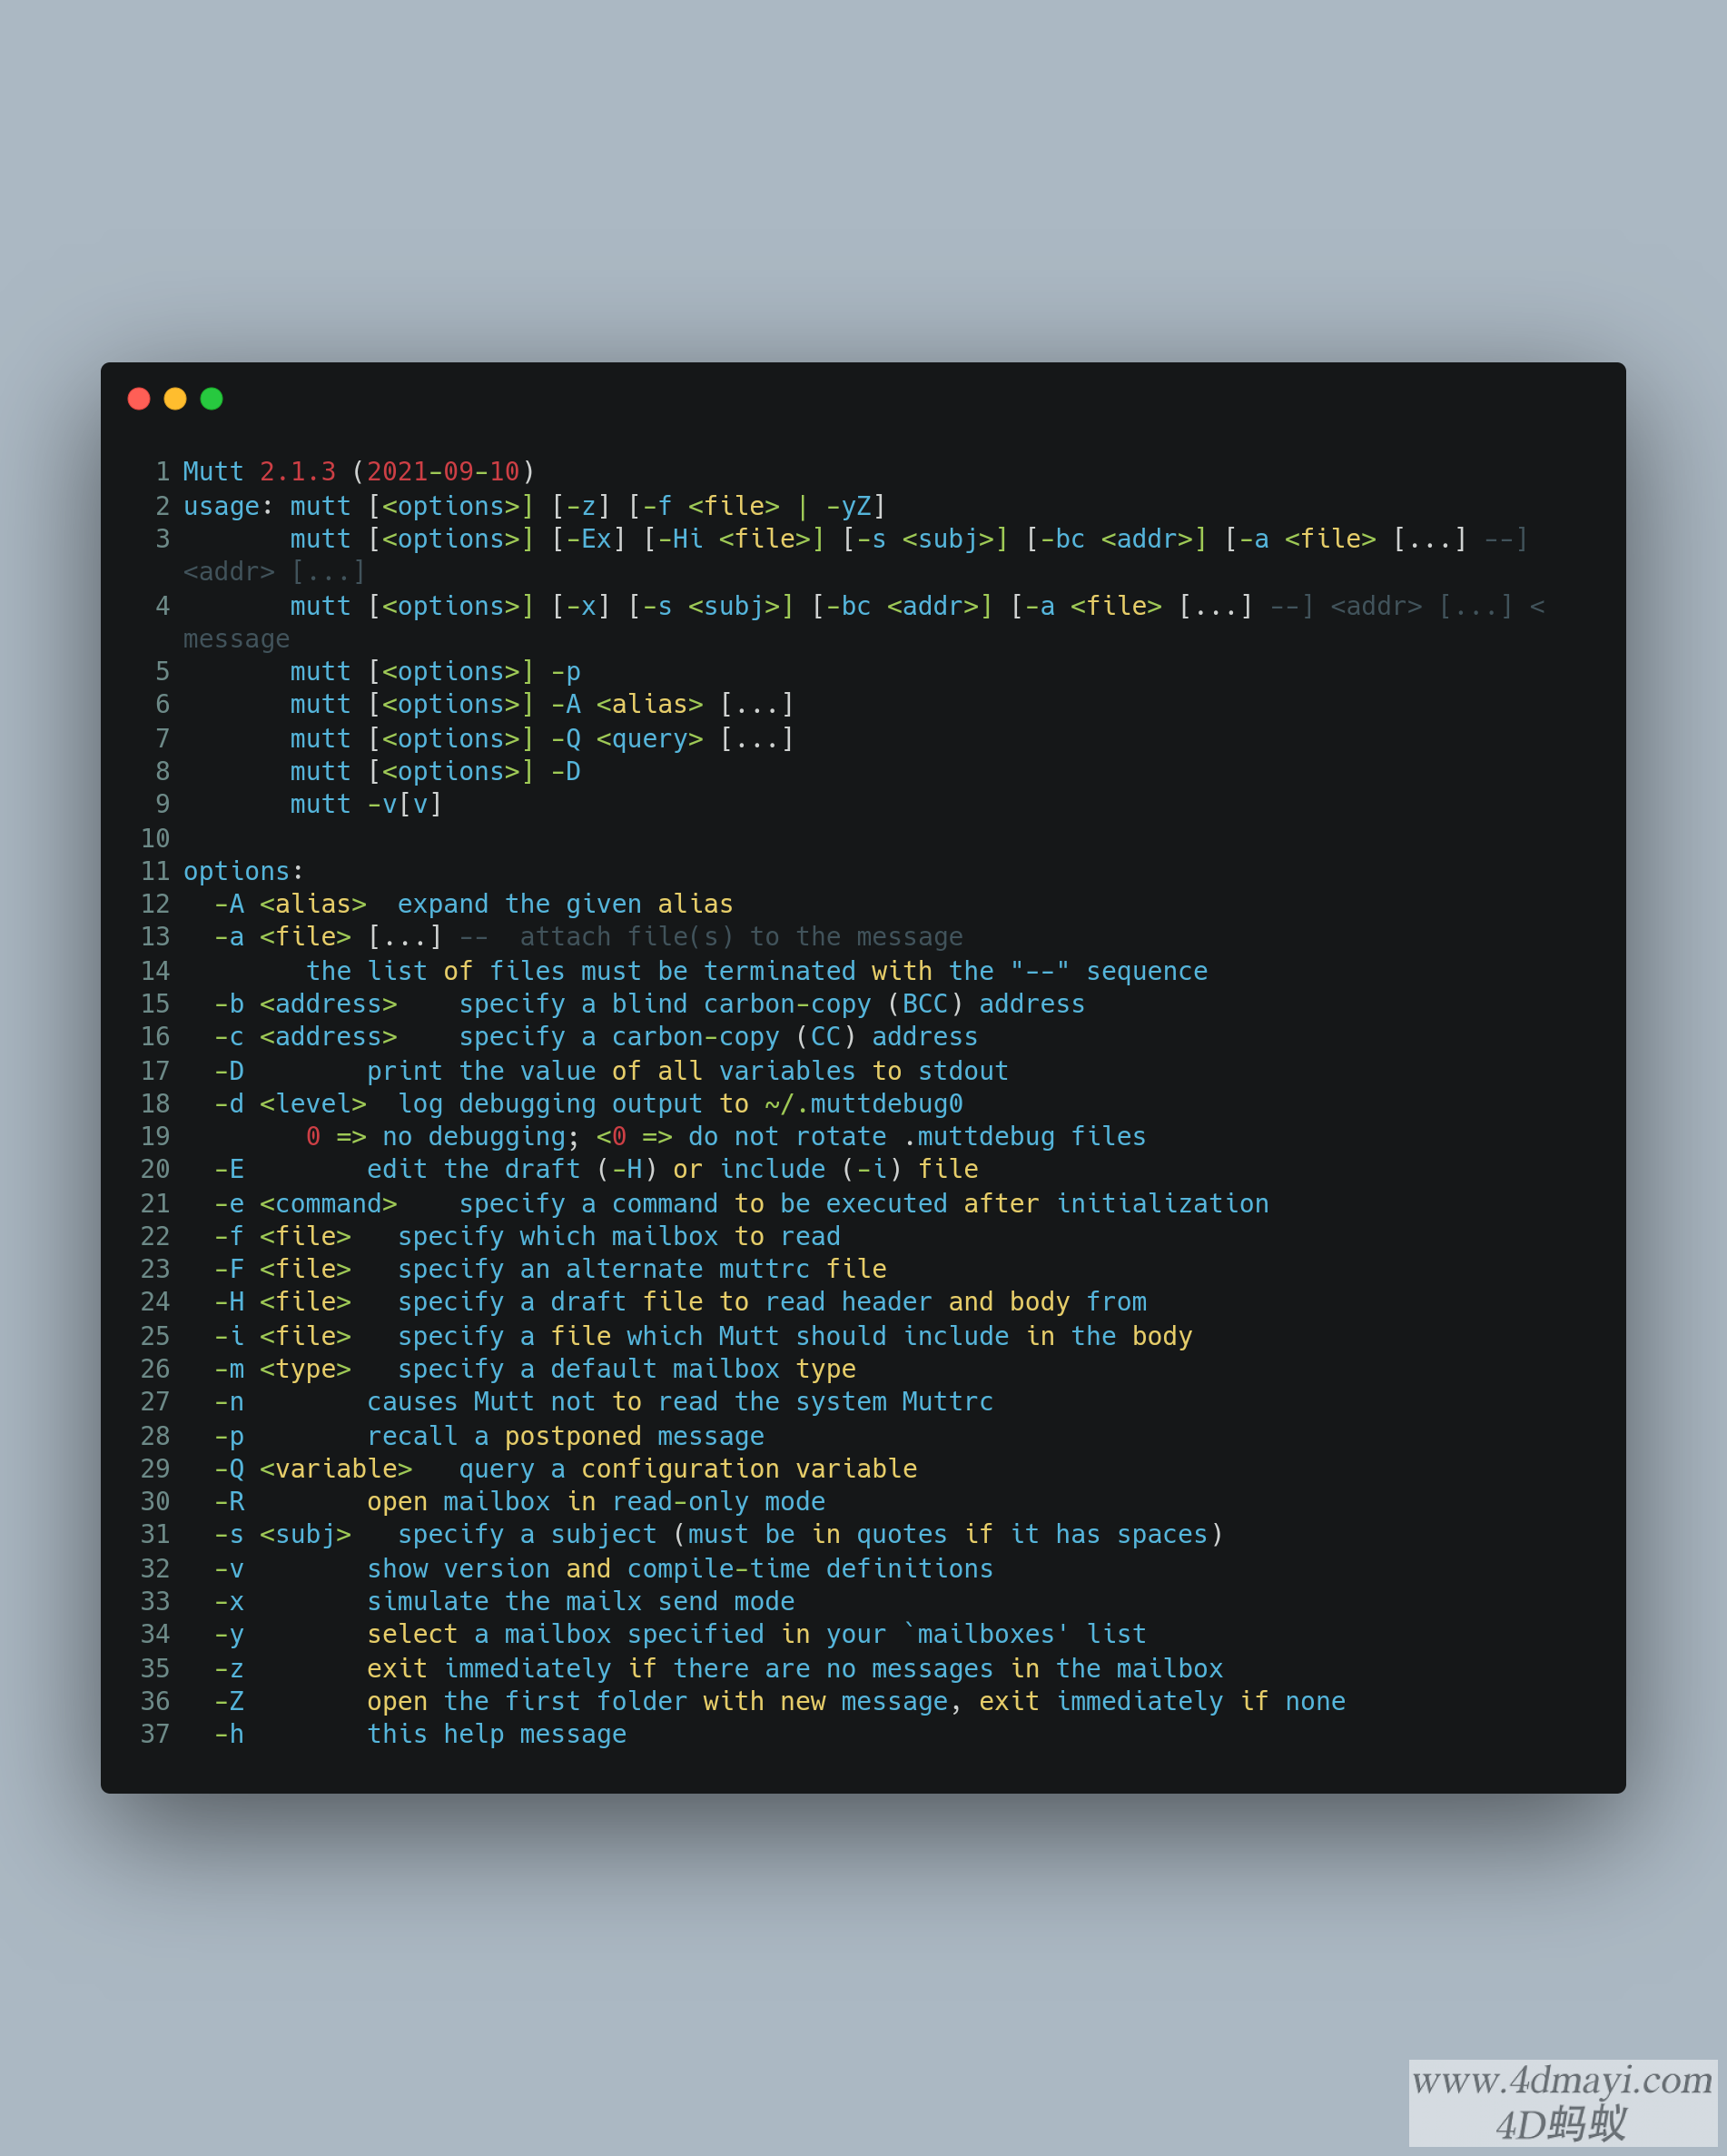 Ubuntu下编译安装最新版Mutt v2.1.3